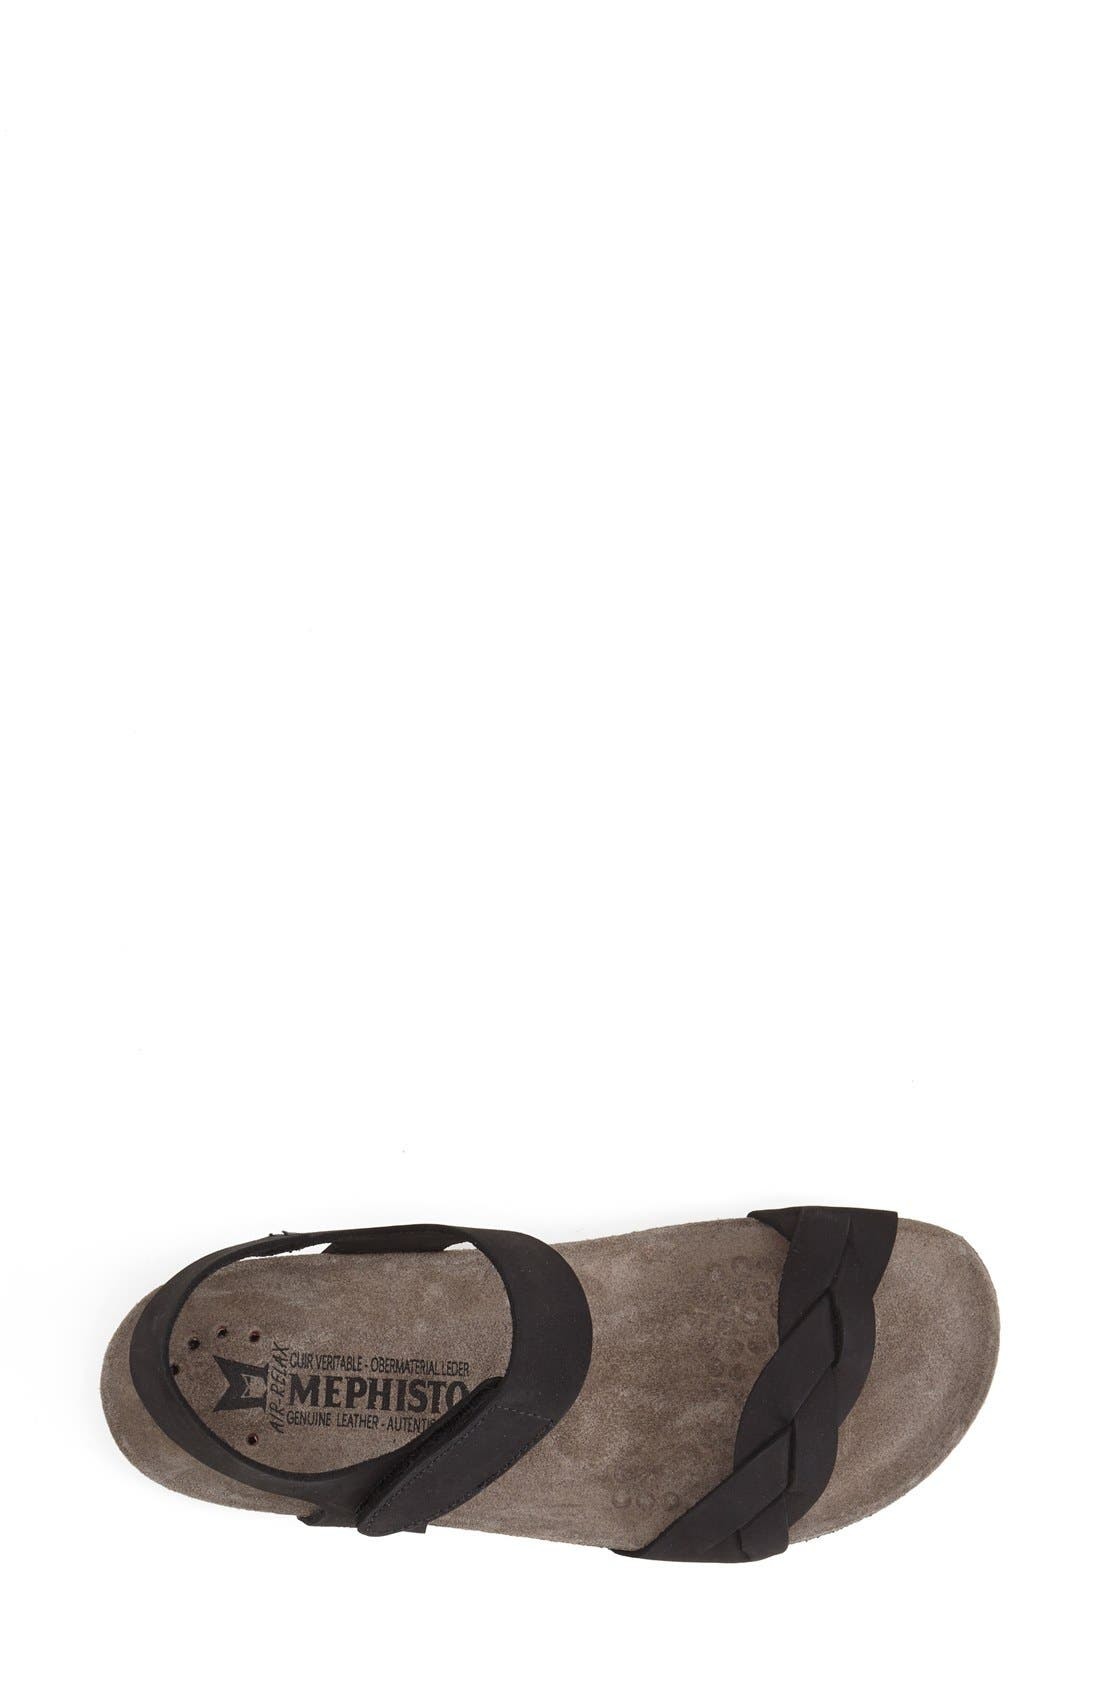 Alternate Image 3  - Mephisto 'Honoria' Nubuck Leather Sandal (Women)